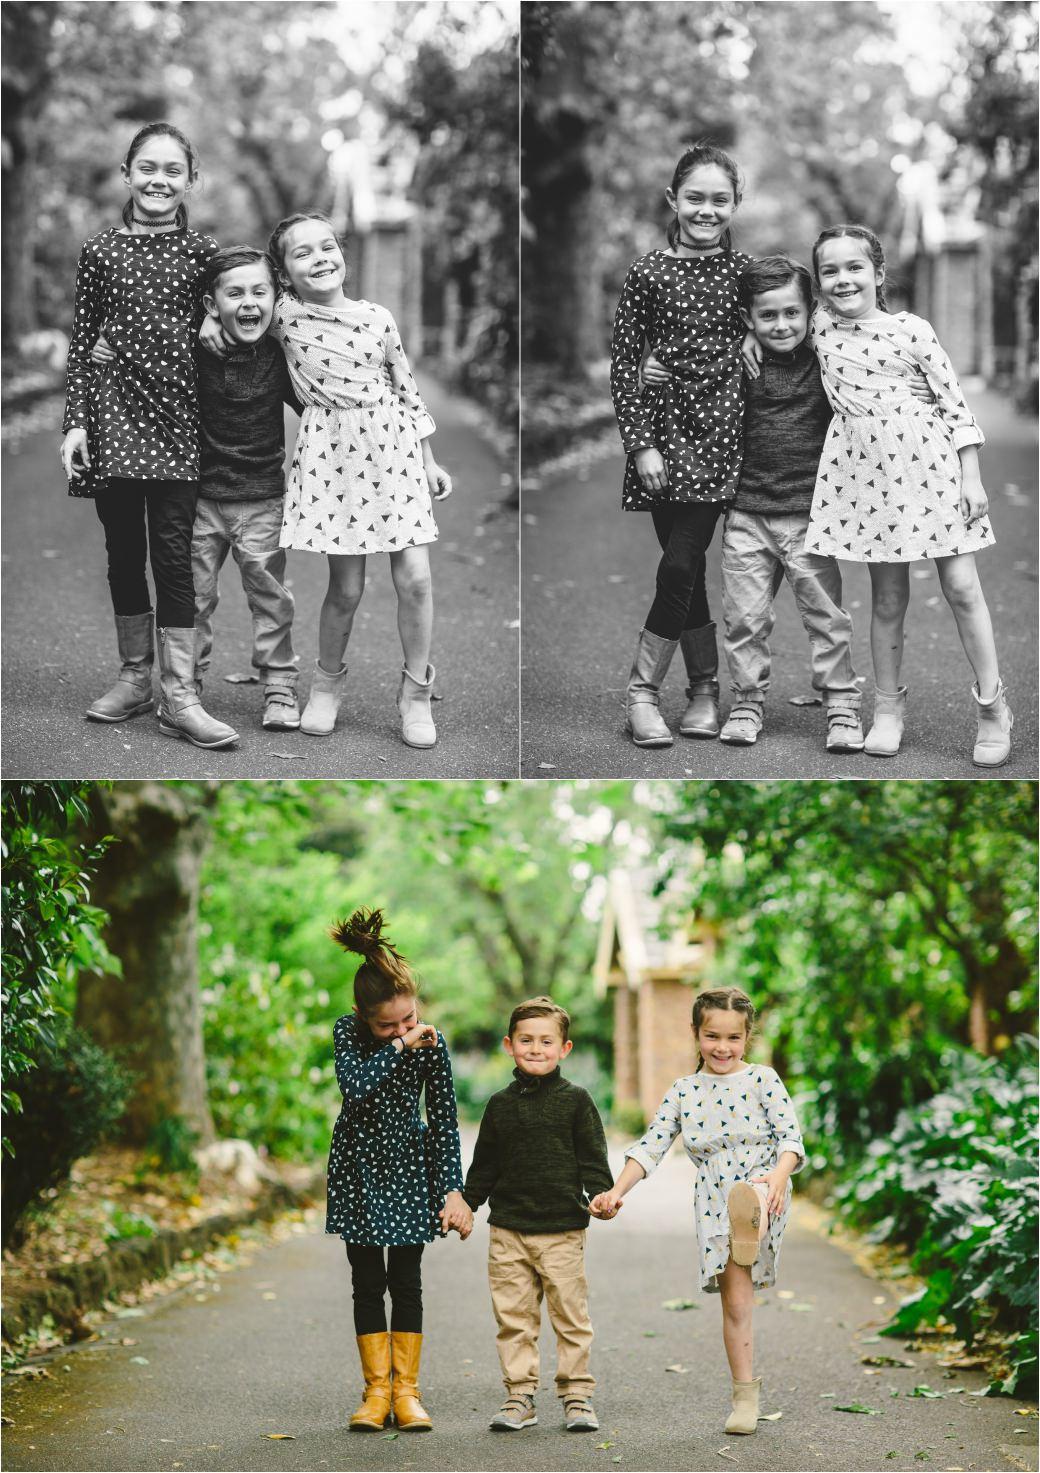 family portrait melbourne family photographer hyggelig photography01